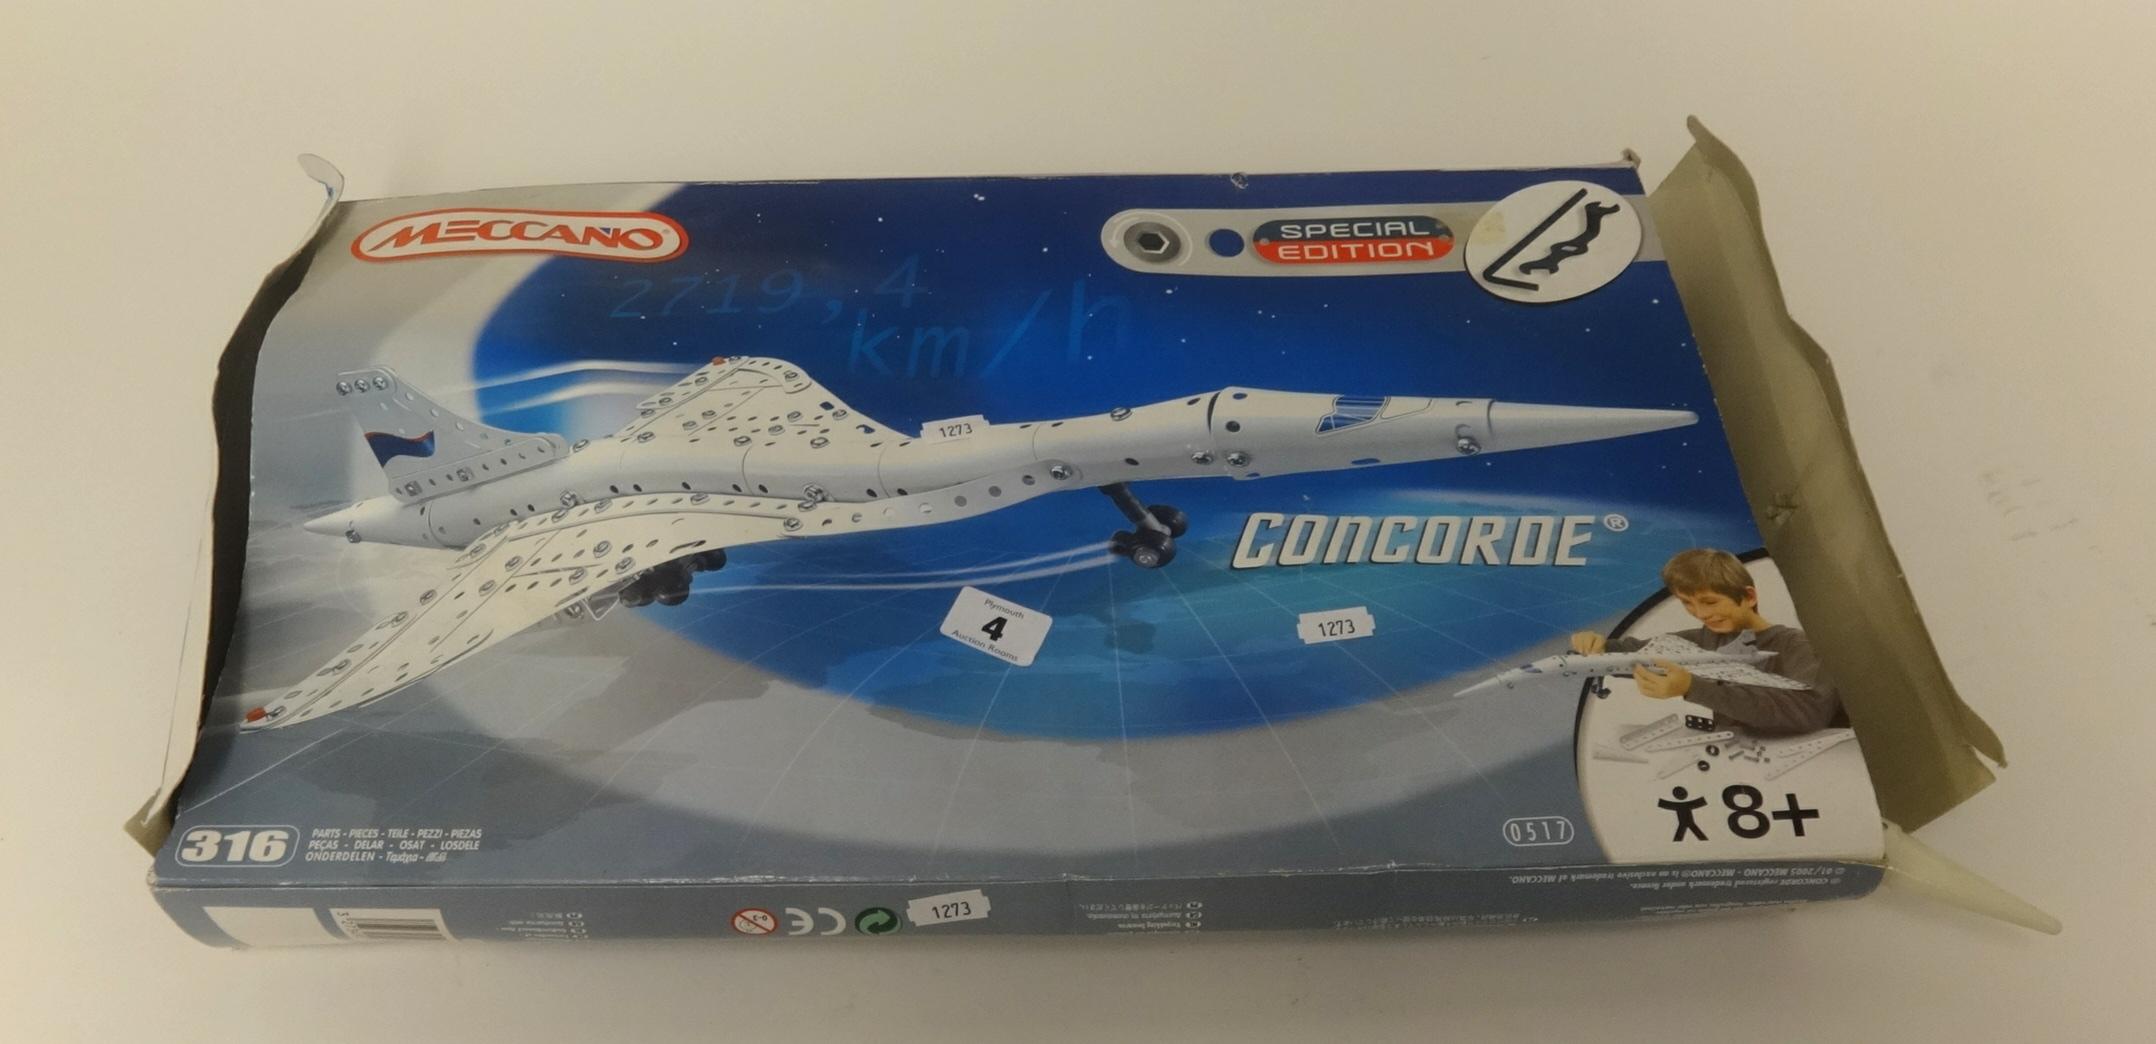 Lot 004 - Meccano, Special Edition Concorde aircraft model.